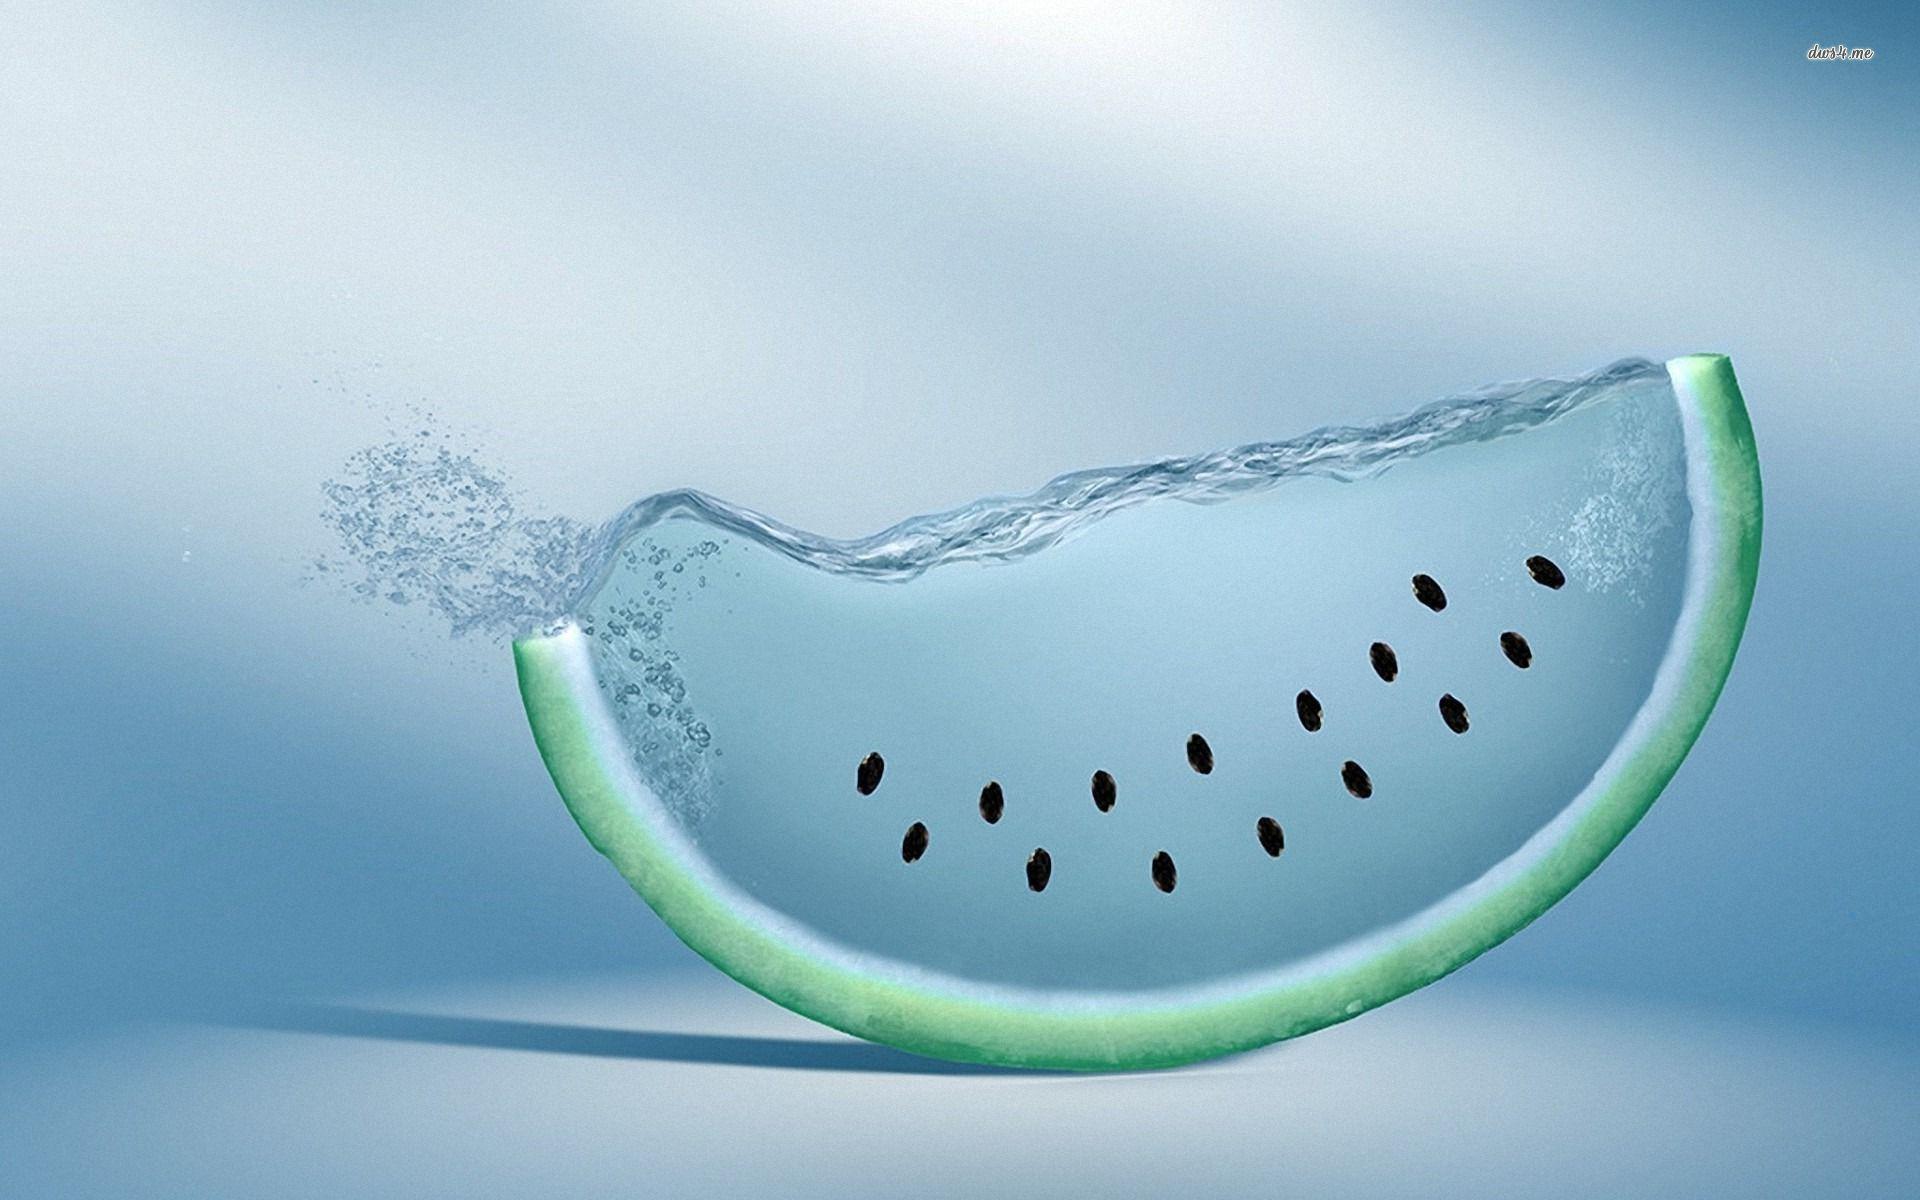 Imagenes De Sandias Para Fondo De Pantalla: Watermelon Full HD Fondo De Pantalla And Fondo De